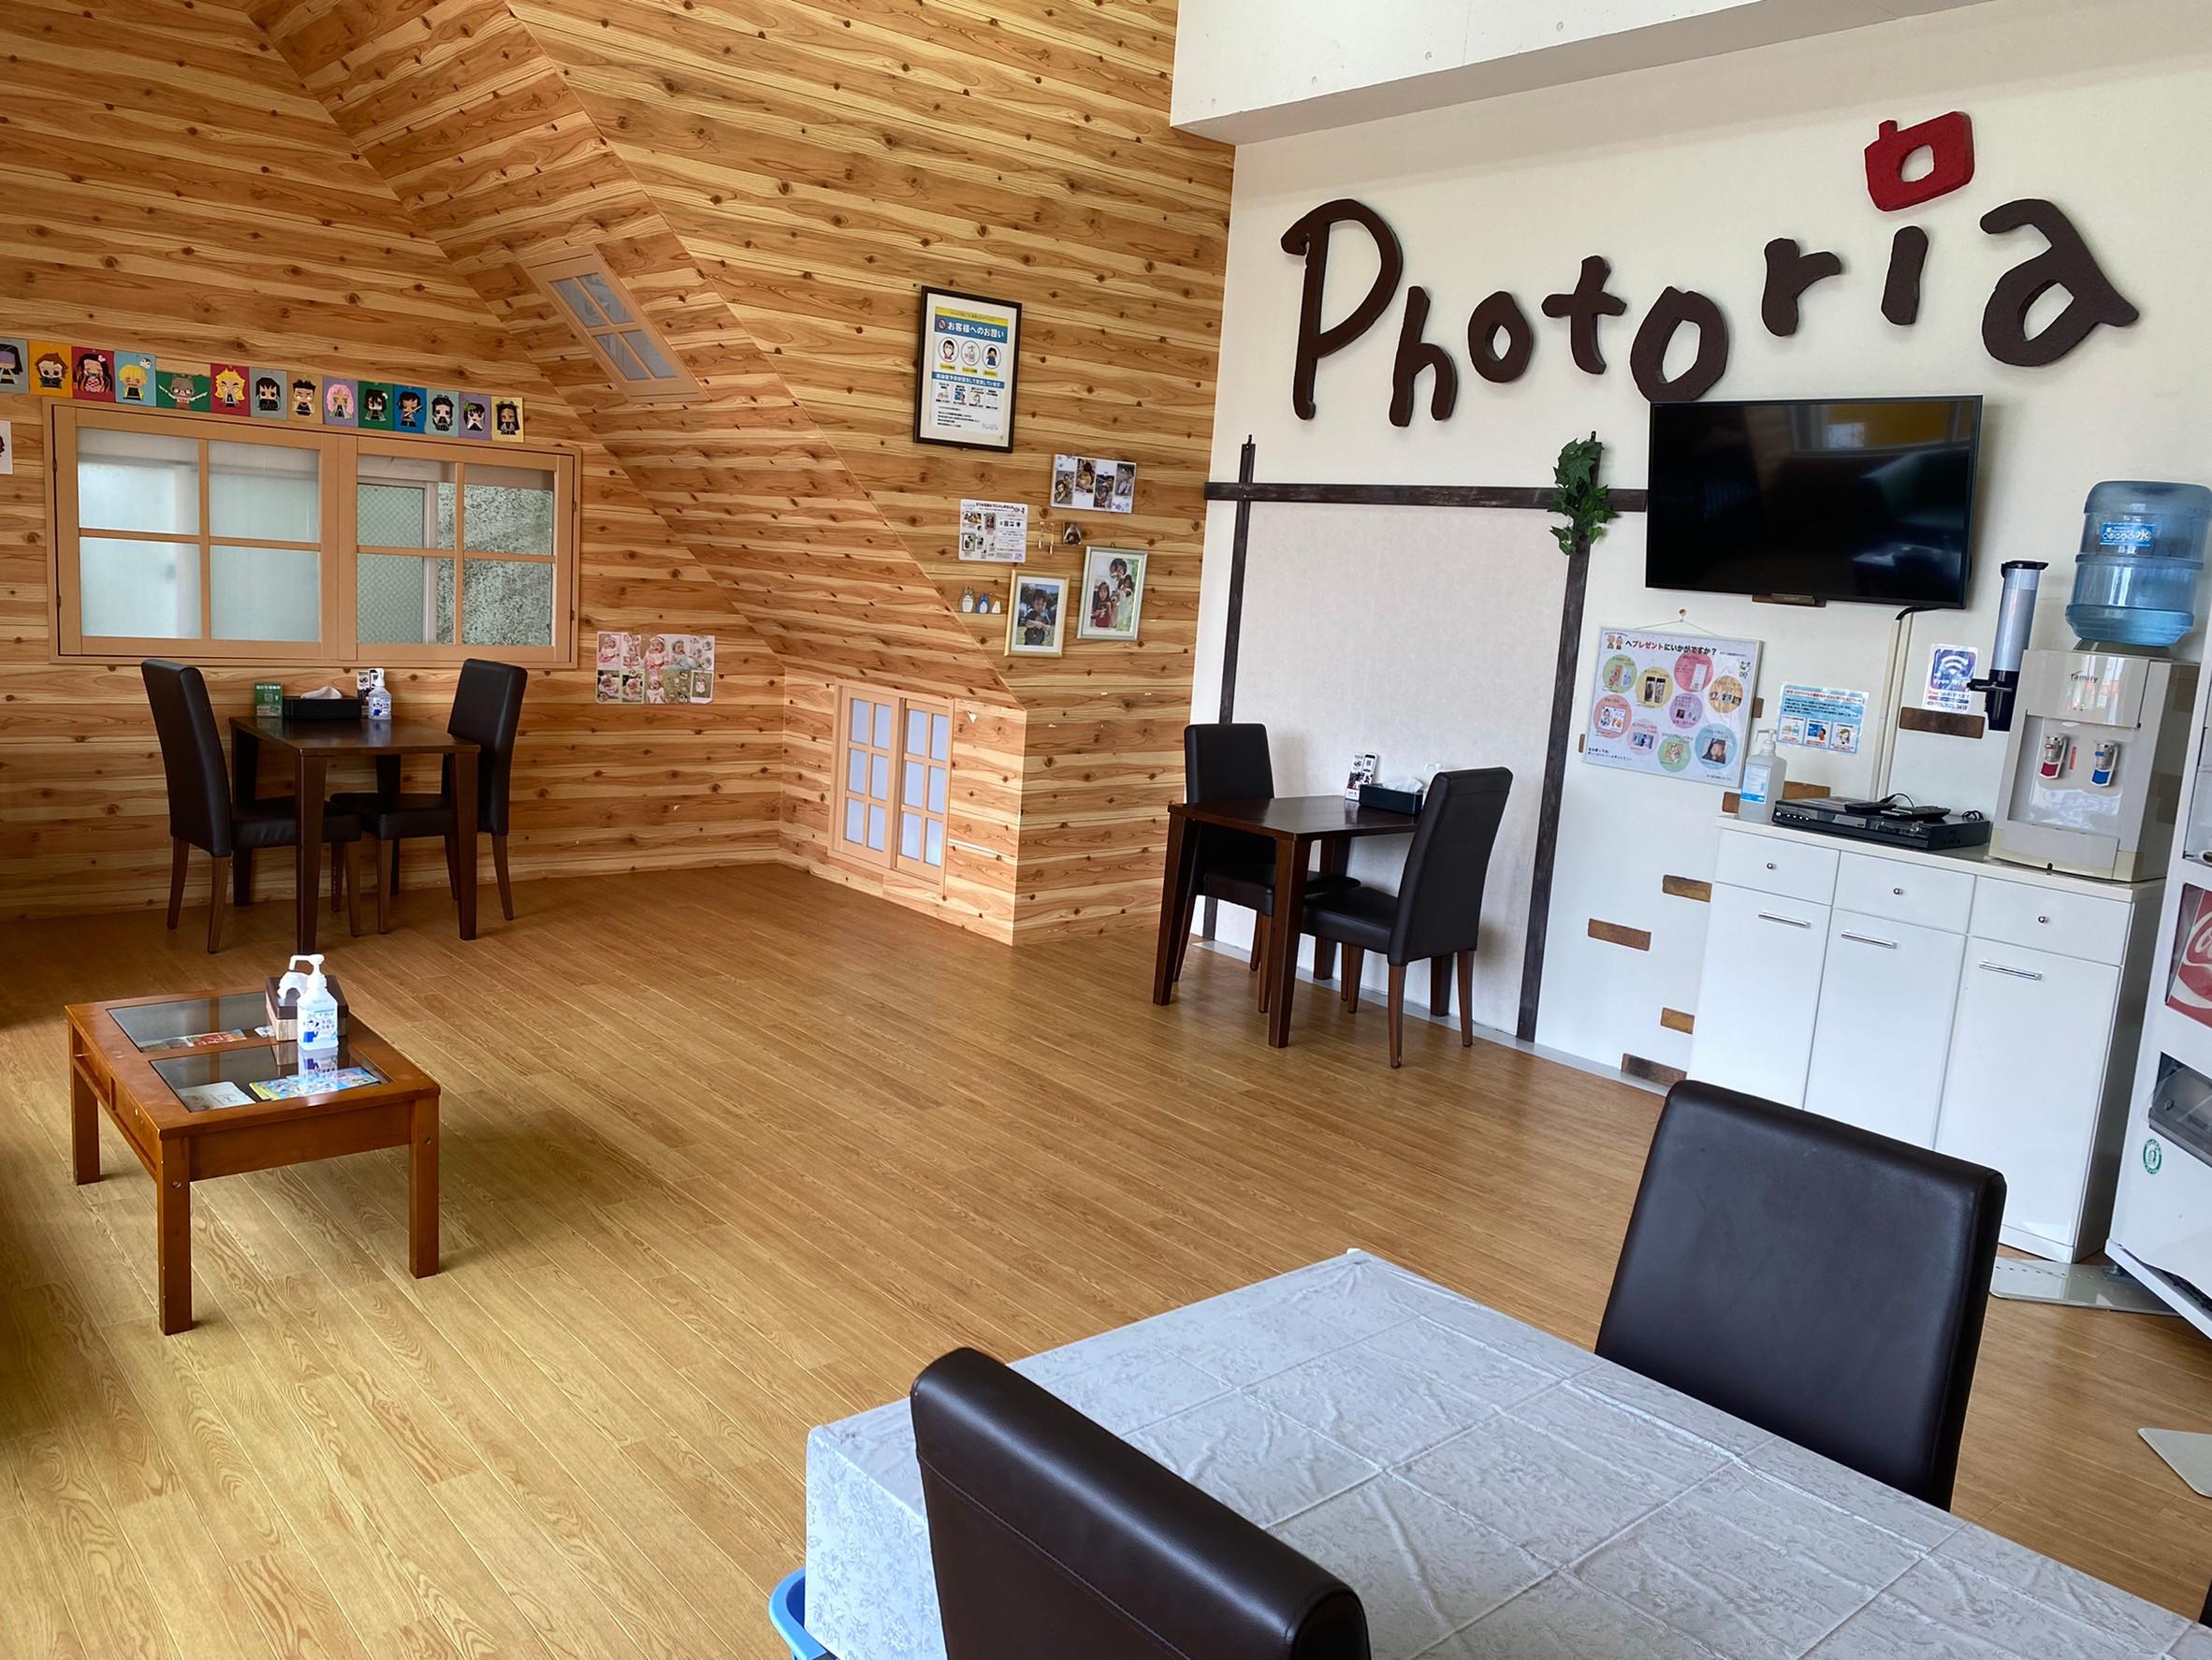 沖縄市胡屋店の写真